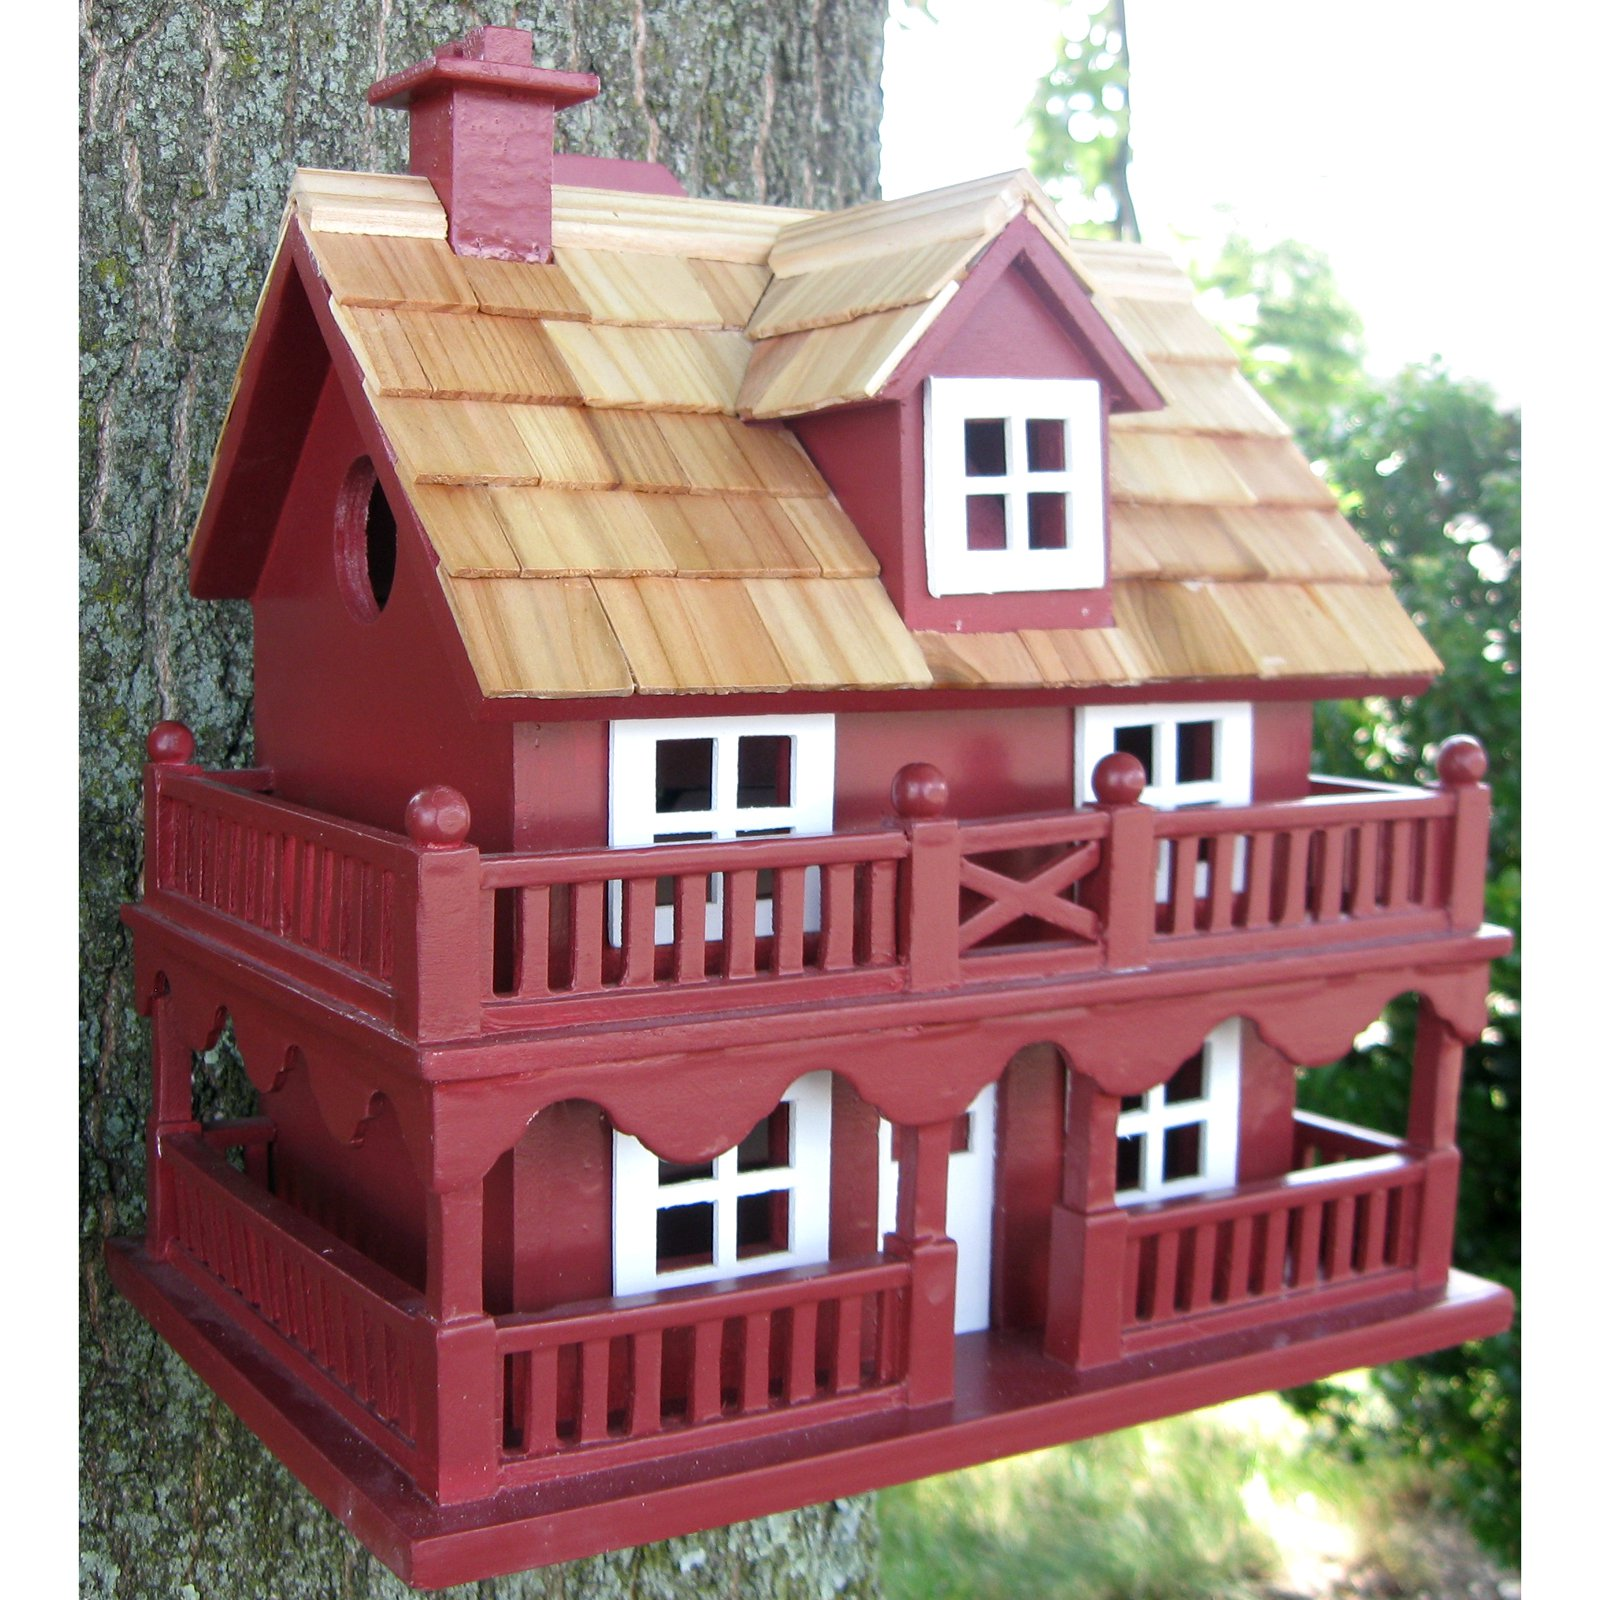 Home Bazaar Novelty Cottage Birdhouse by Home Bazaar Inc.